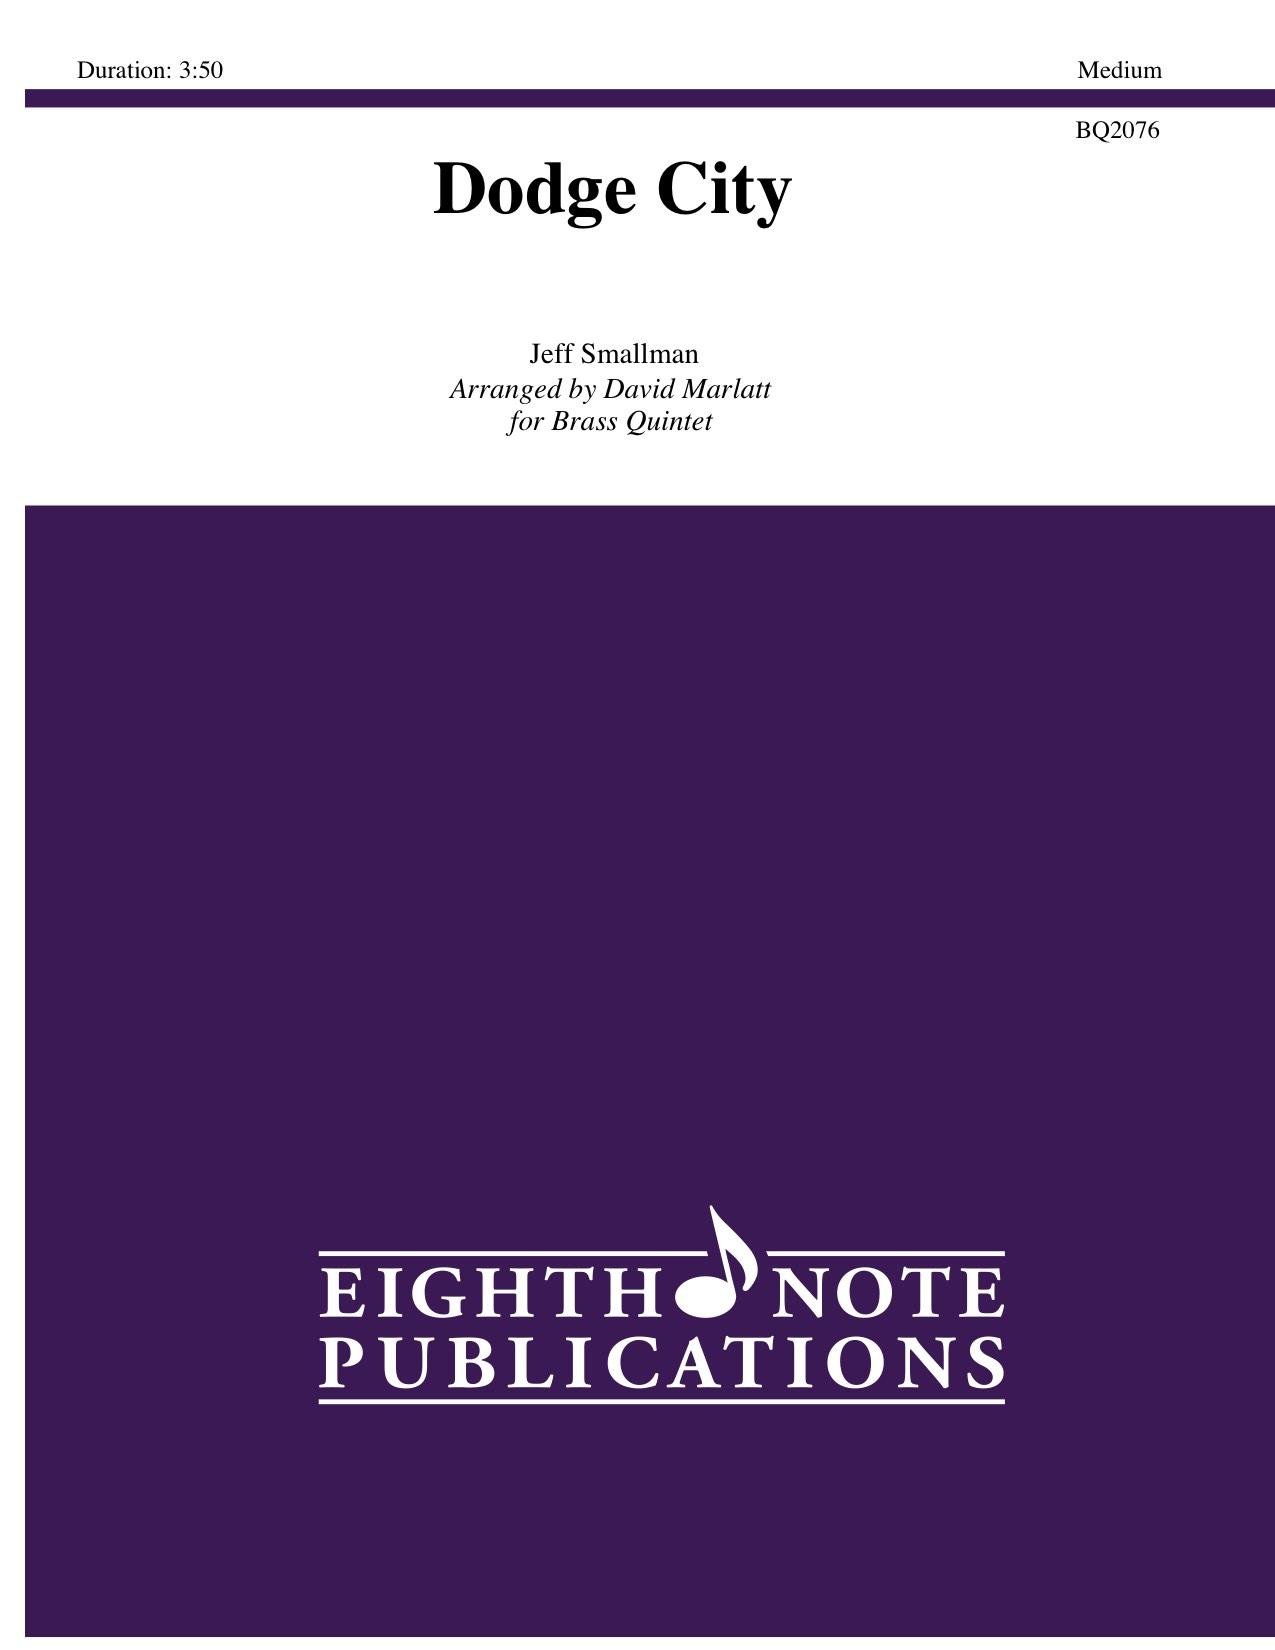 Dodge City - Jeff Smallman